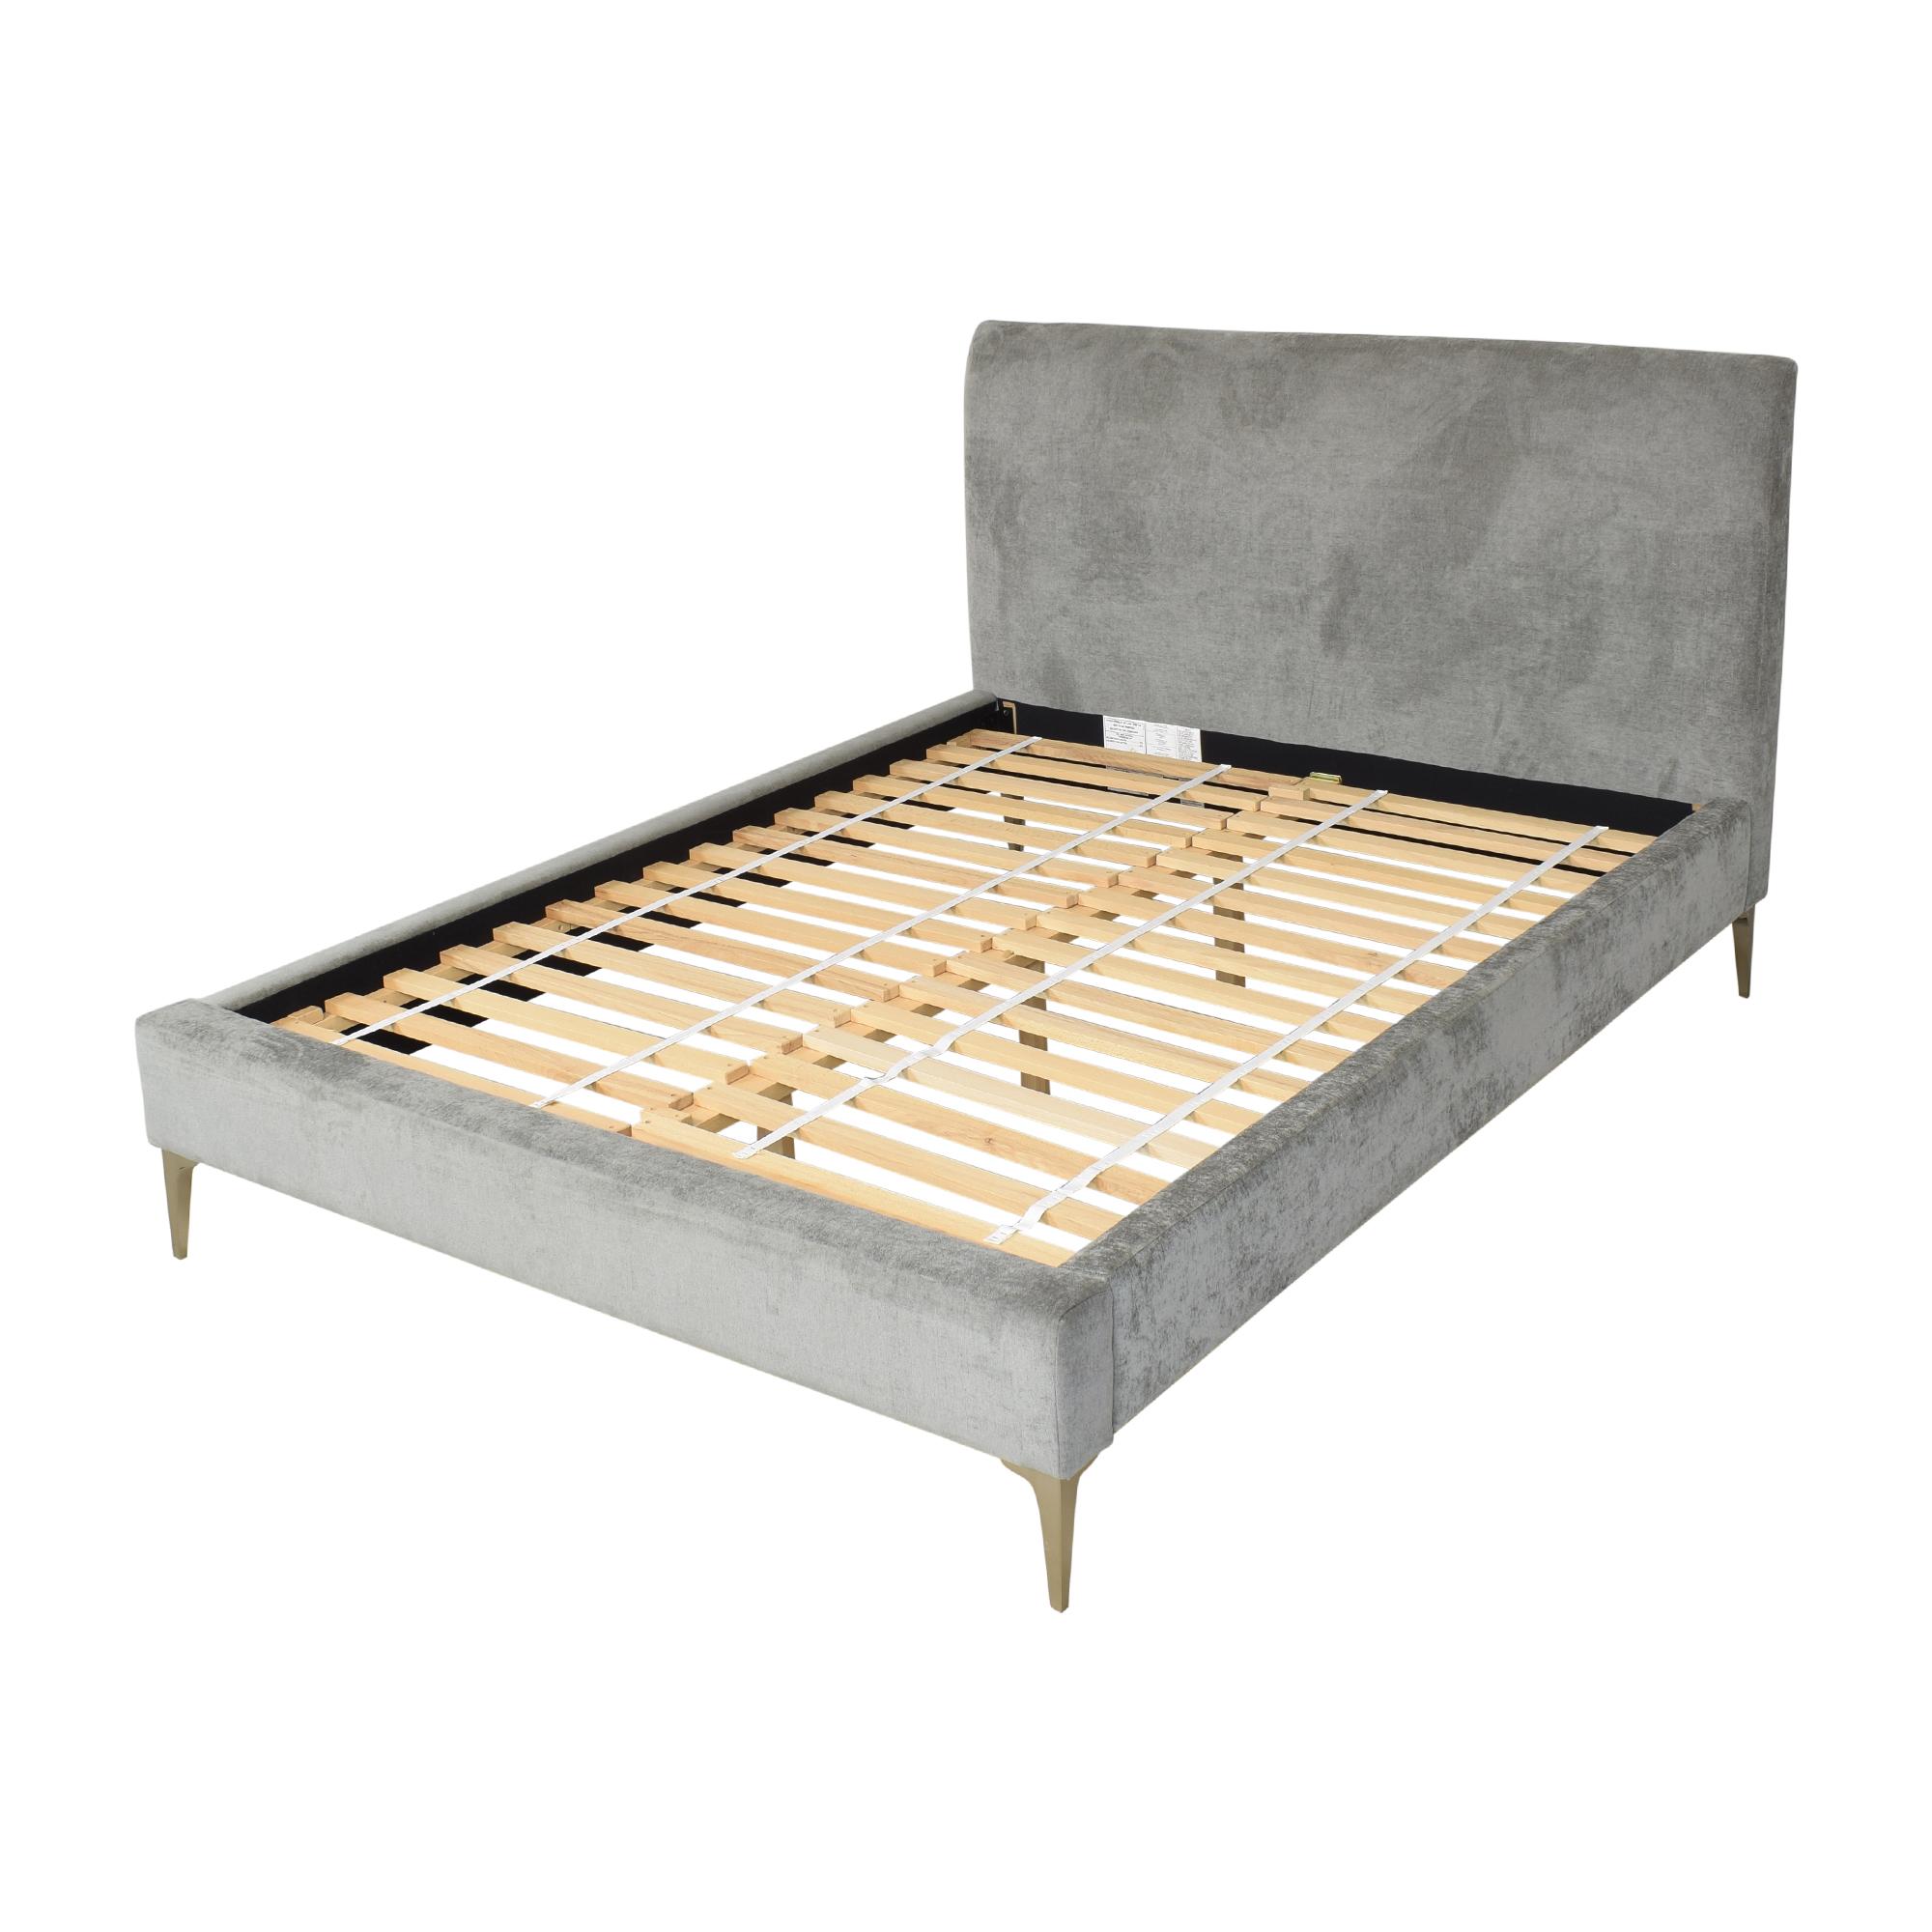 West Elm West Elm Andes Deco Upholstered Queen Bed